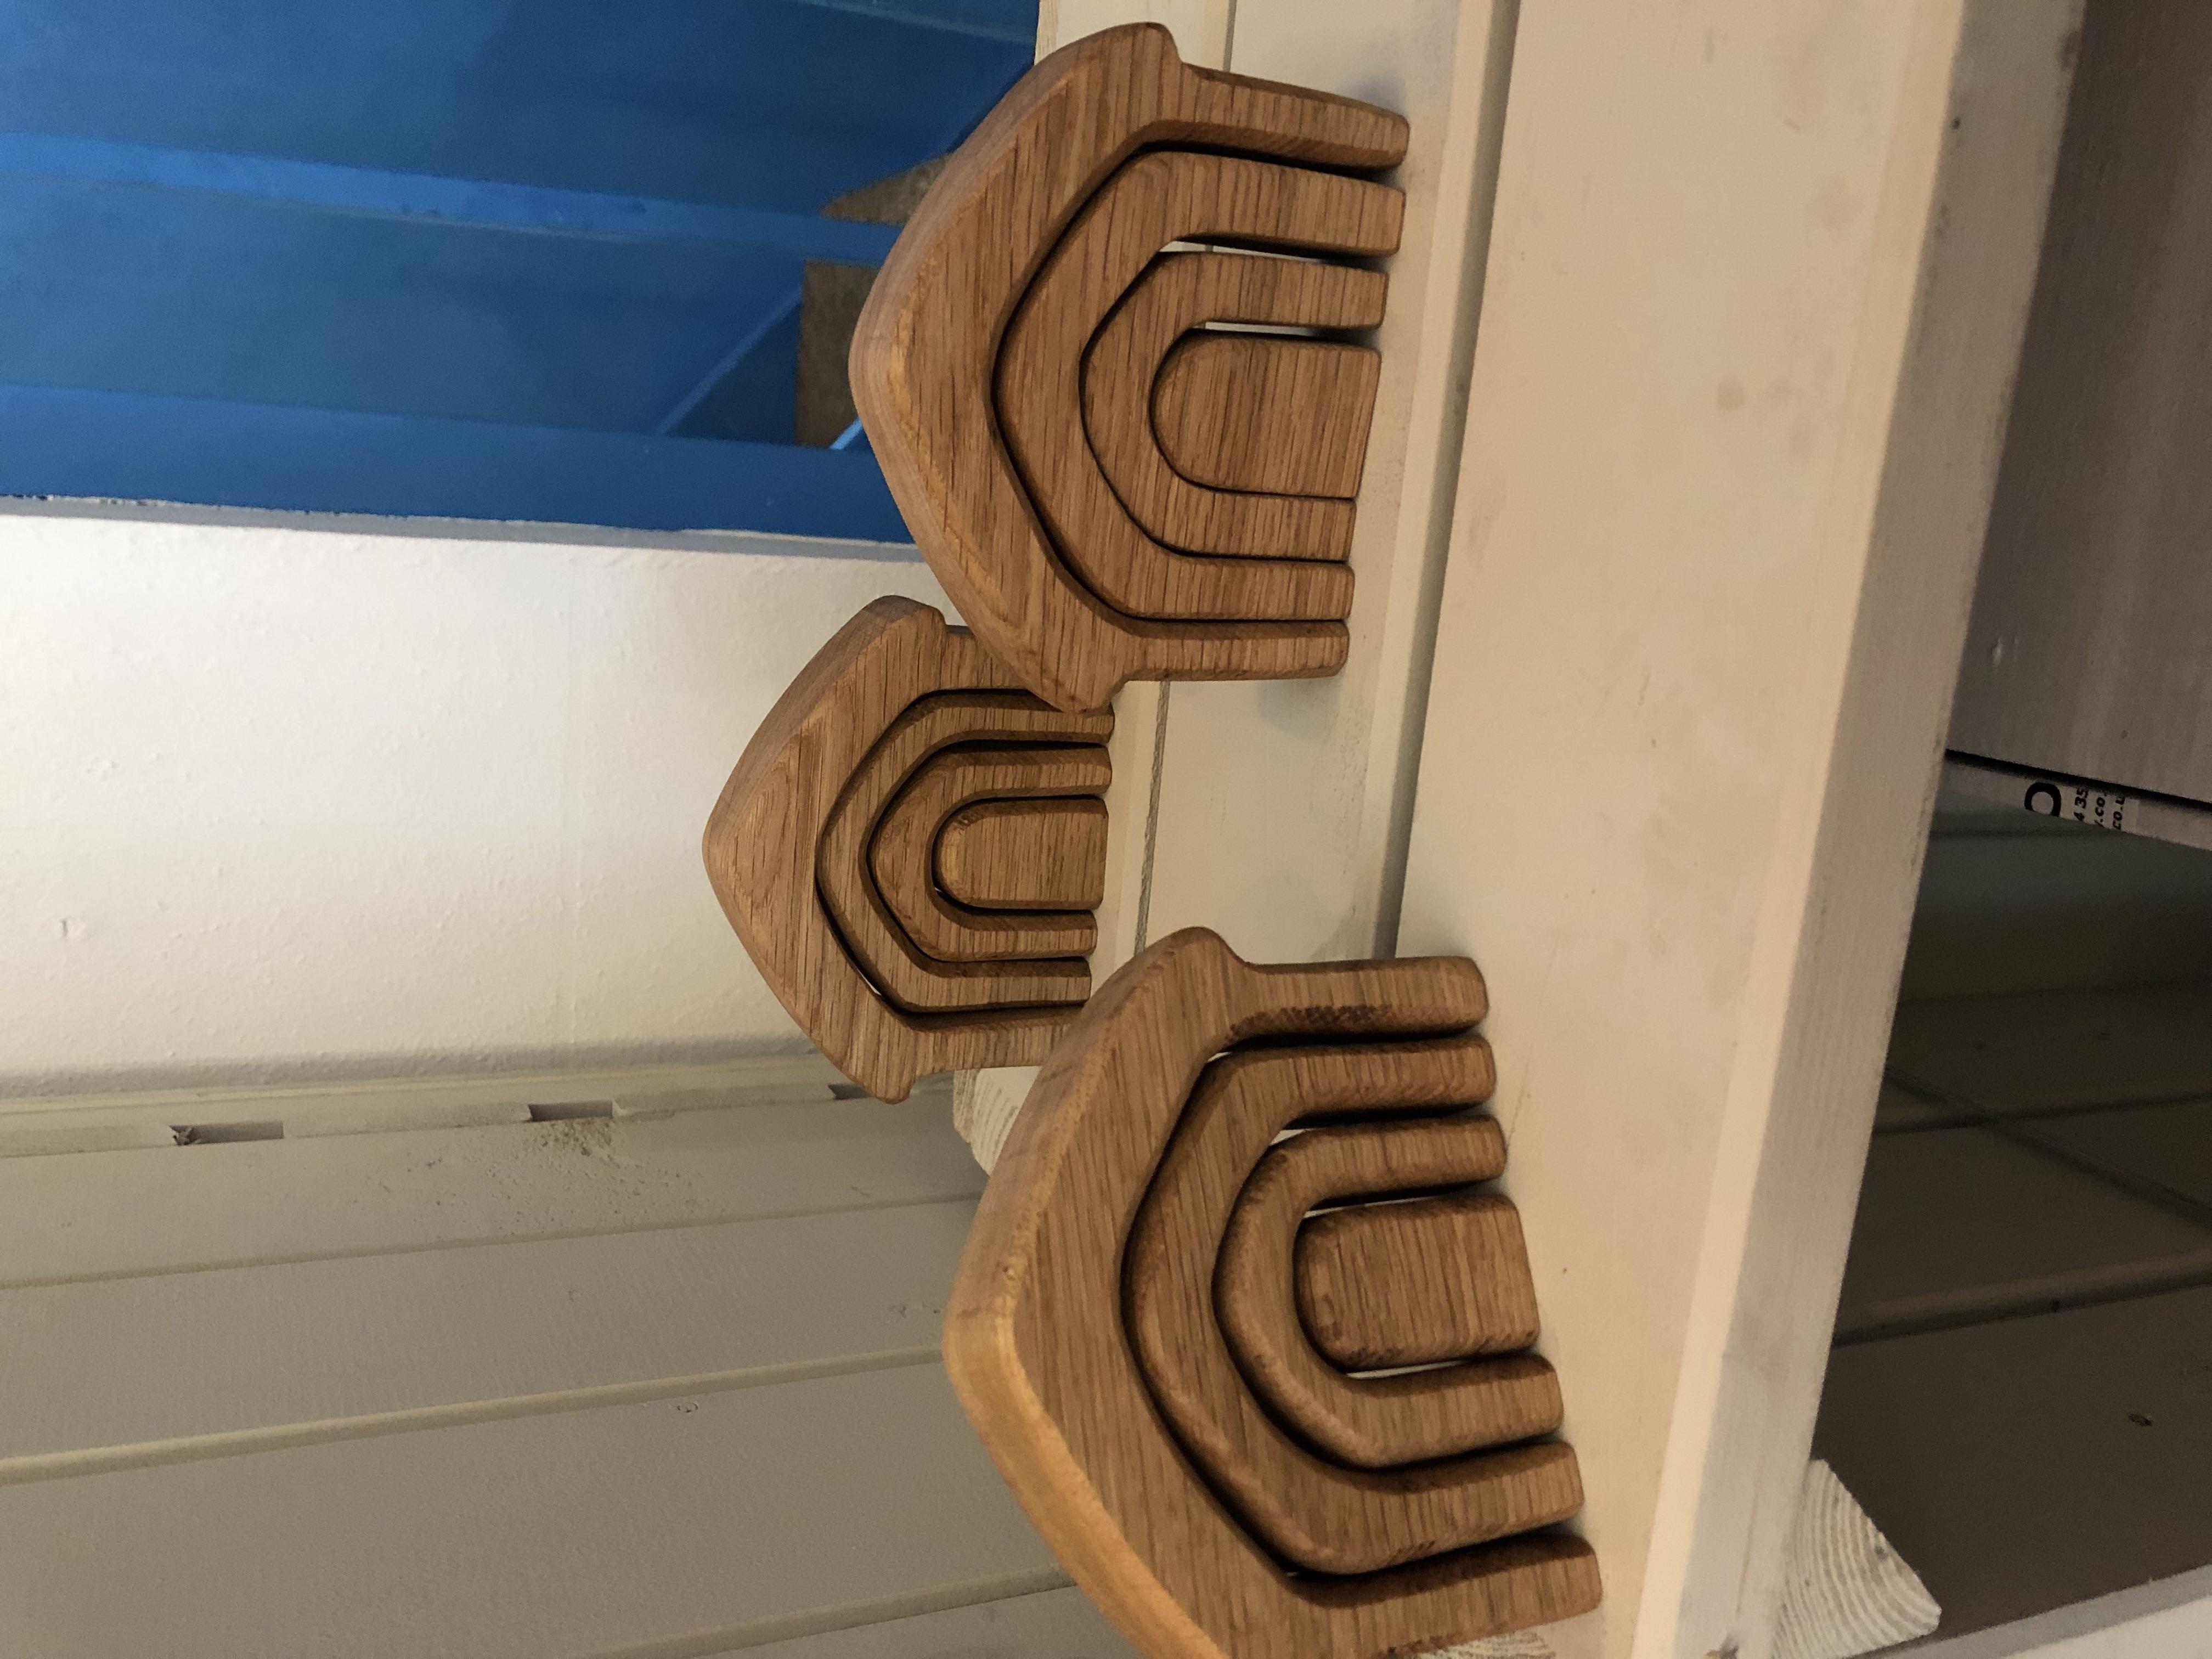 Limited edition scottish oak wooden house